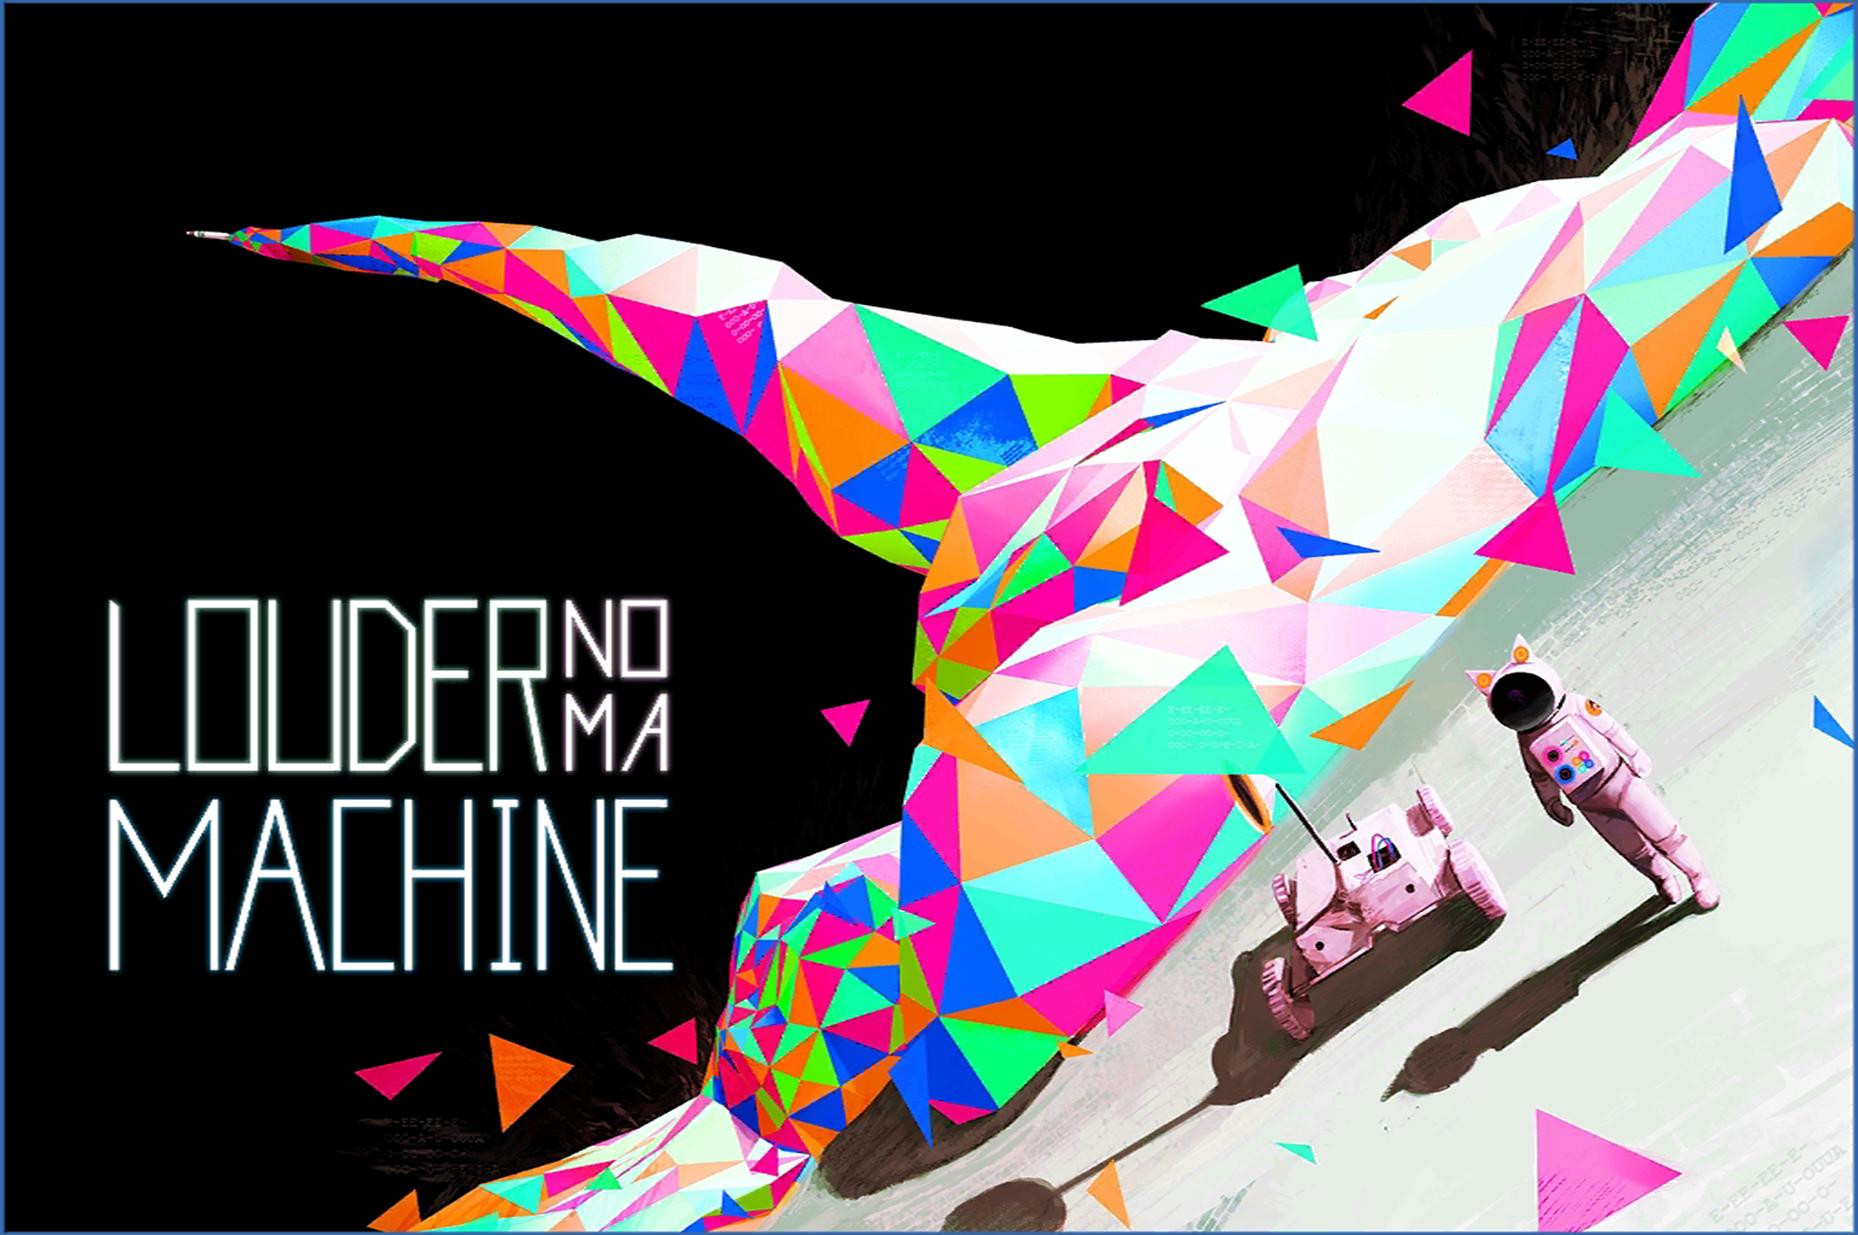 LOUDER MACHINE